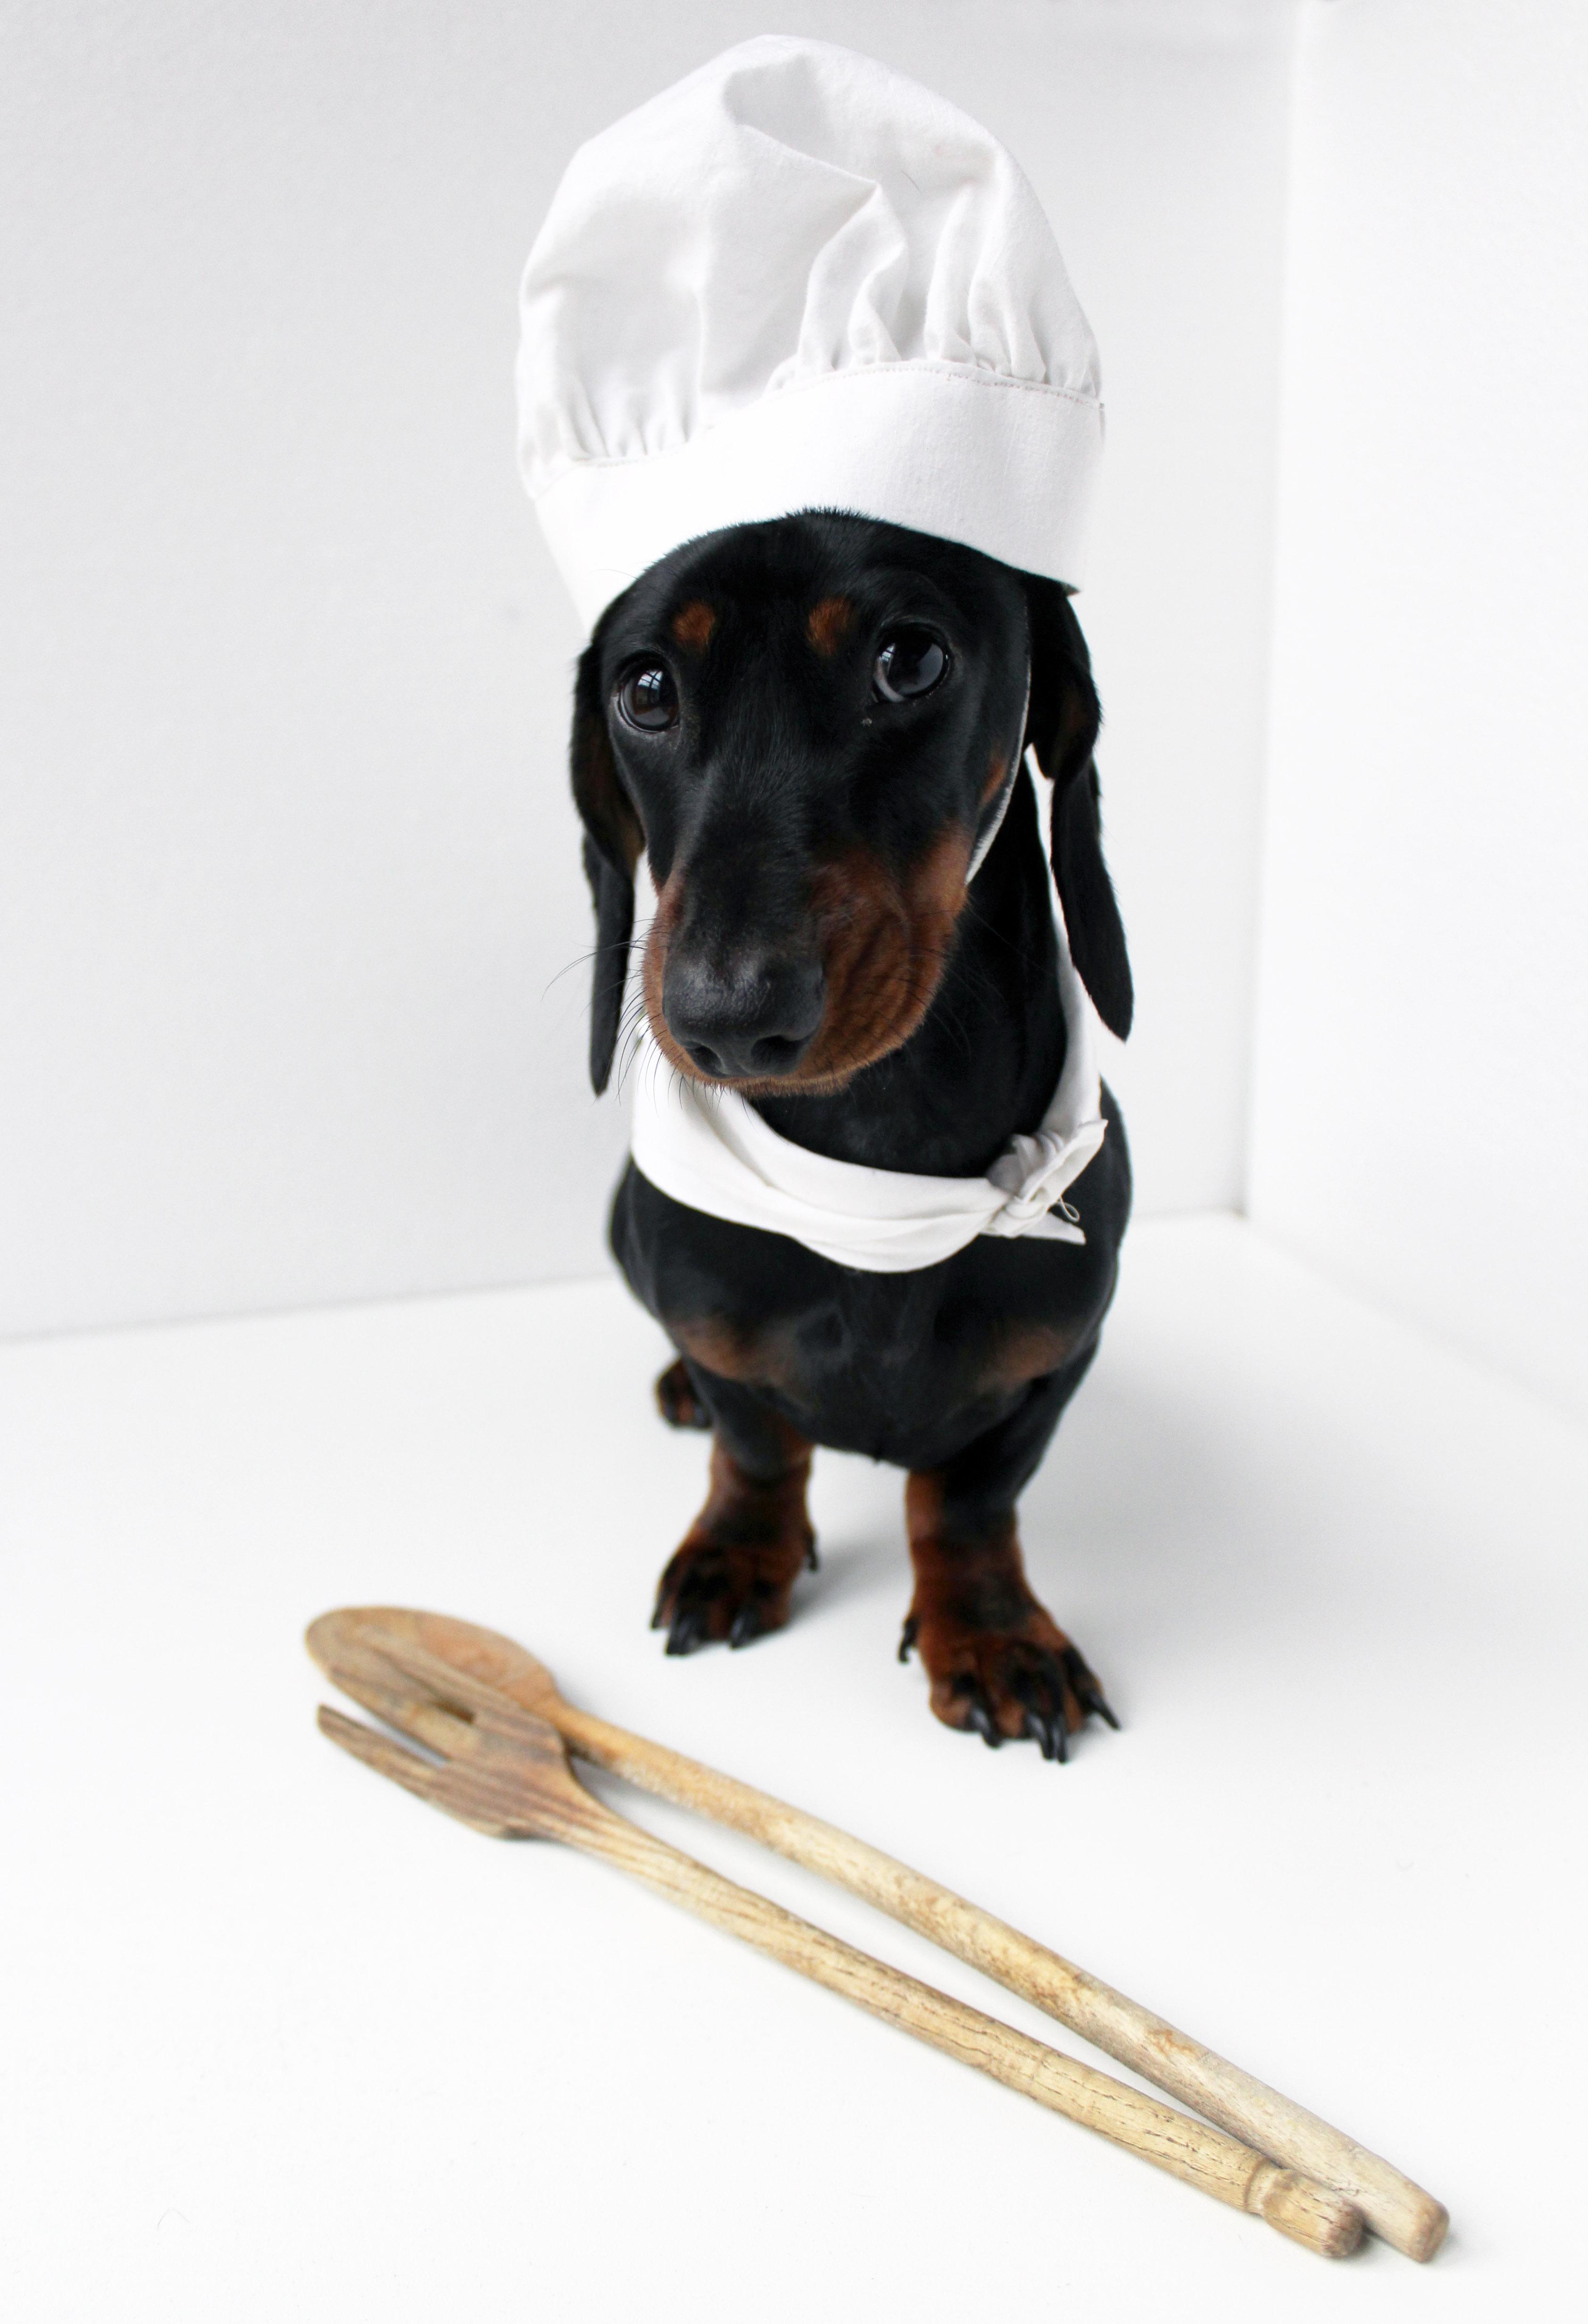 Chef Napoleone